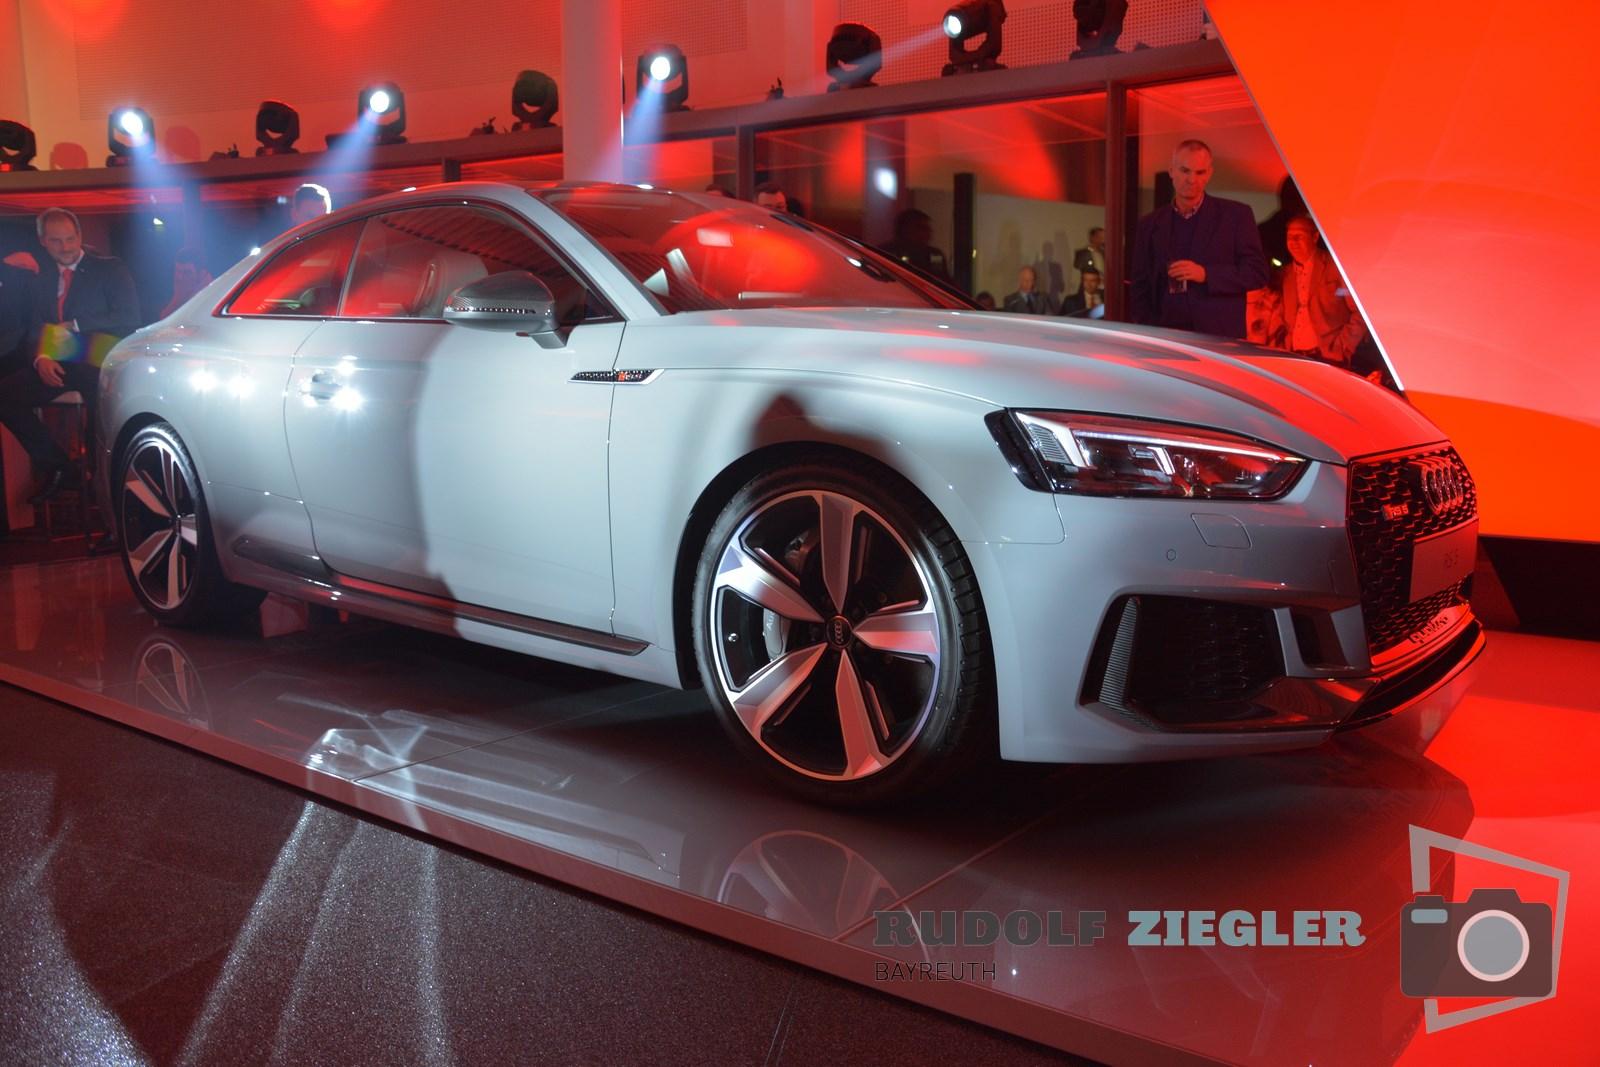 Eröffnung Audi Sport - 1 110-A (1600x1200)